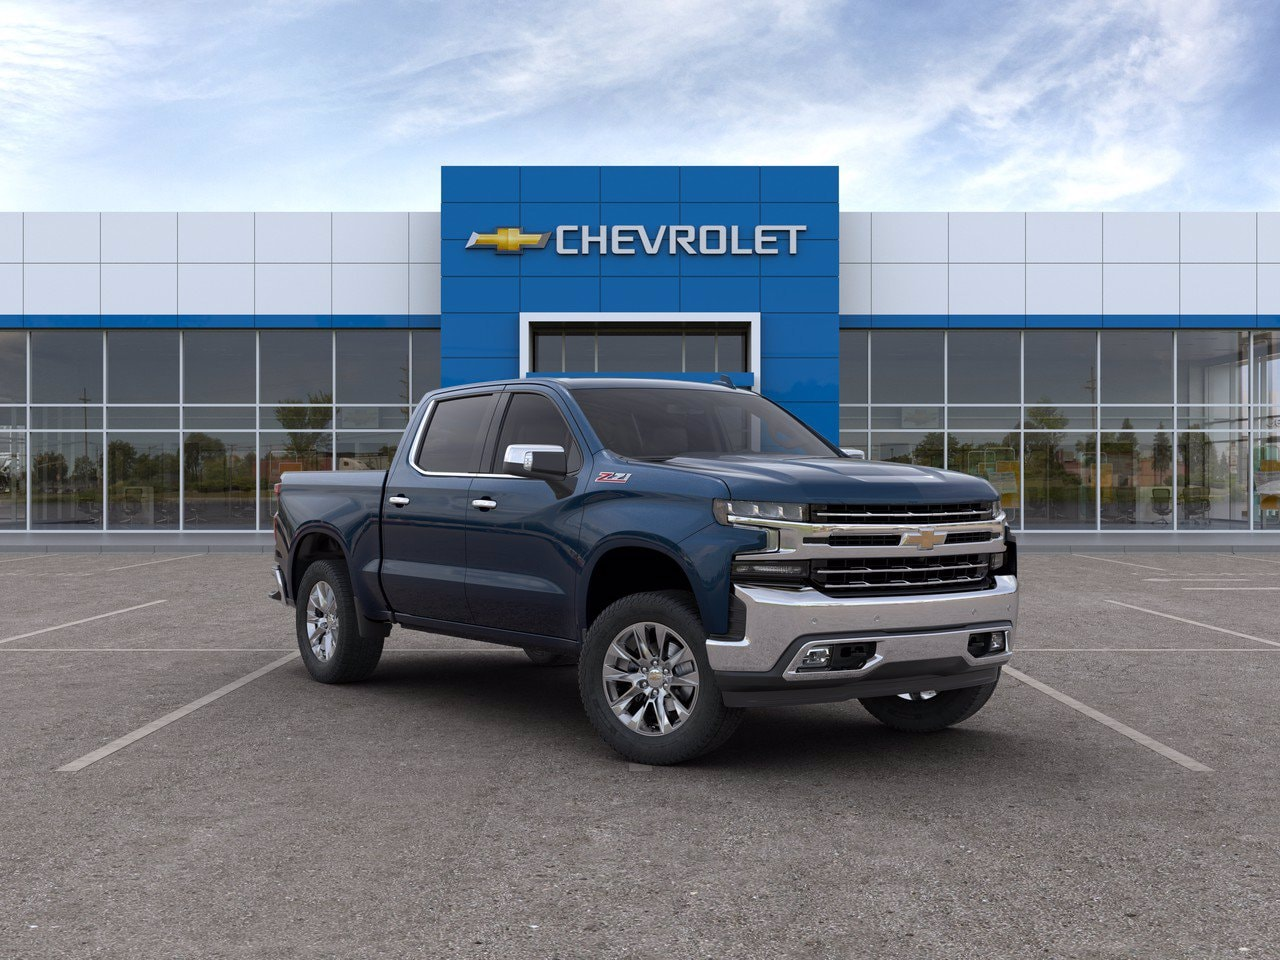 2020 Chevrolet Silverado 1500 Crew Cab 4x4, Pickup #C201434 - photo 1